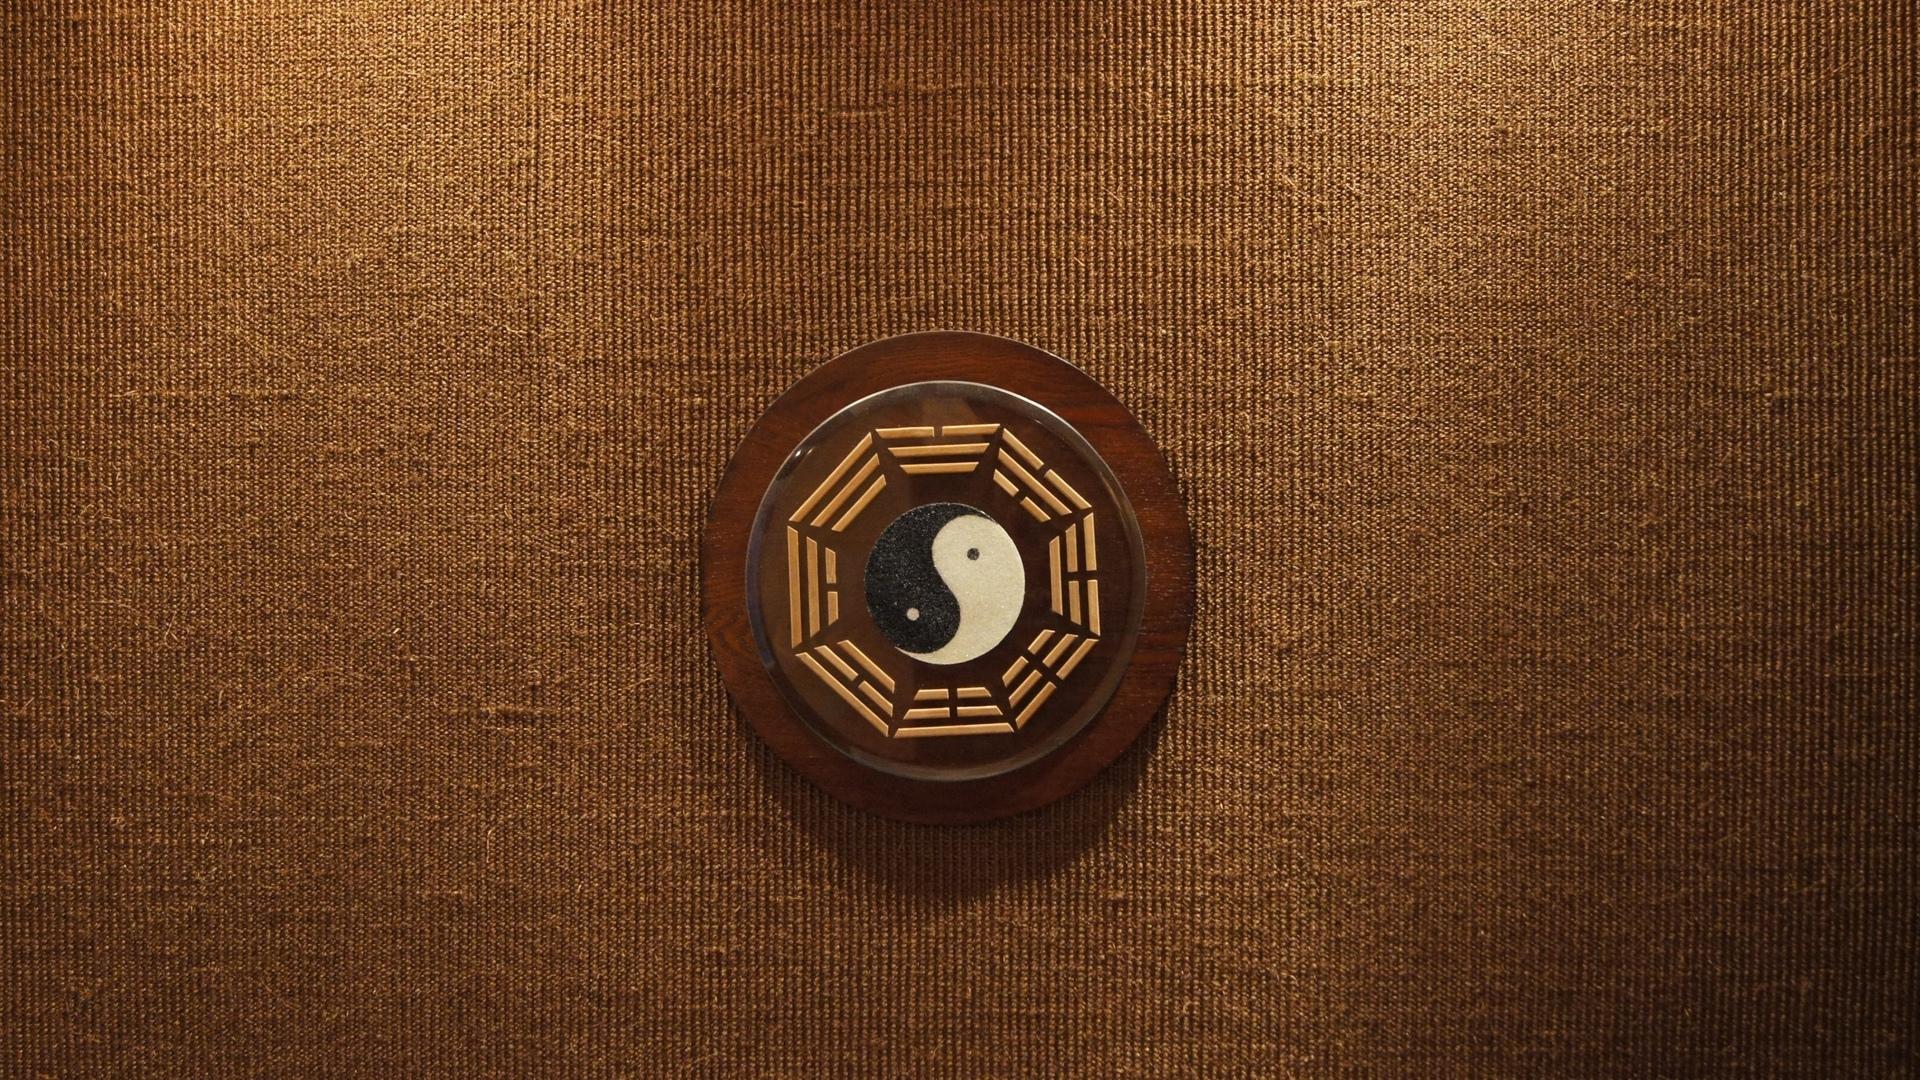 Yin & Yang HD Wallpaper   Background Image   1920x1080 ...